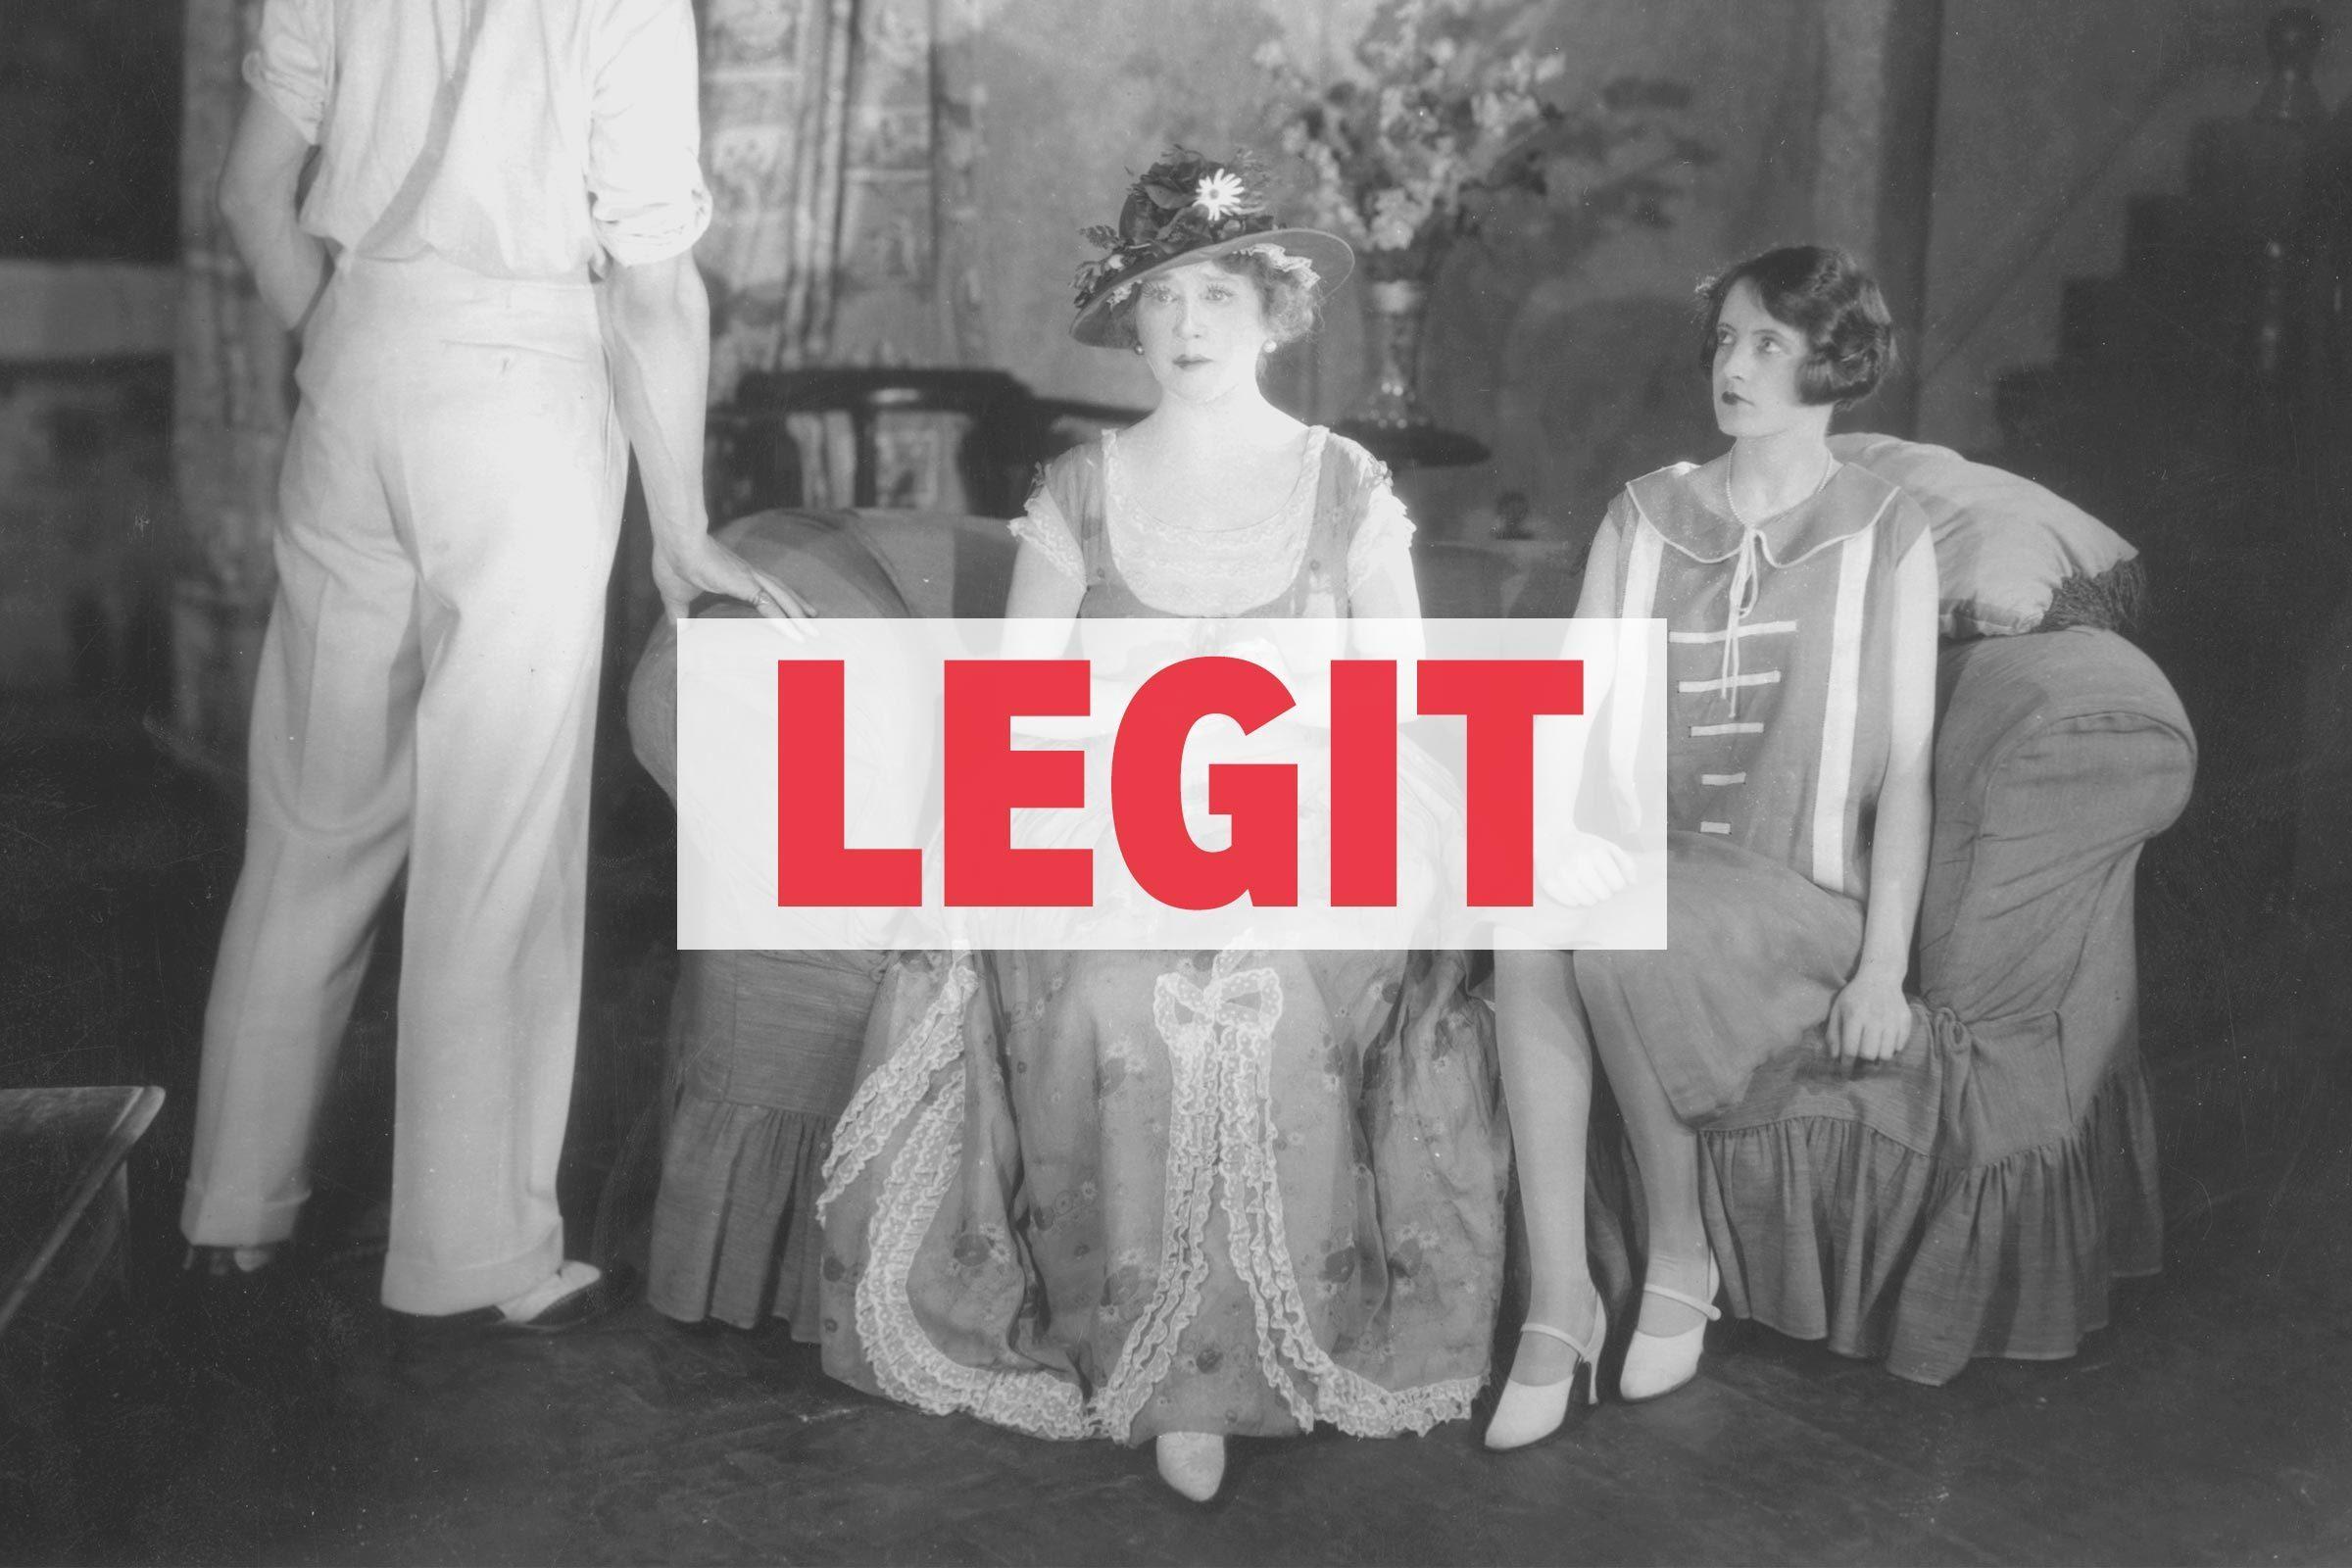 """LEGIT"" over vintage theater performance"